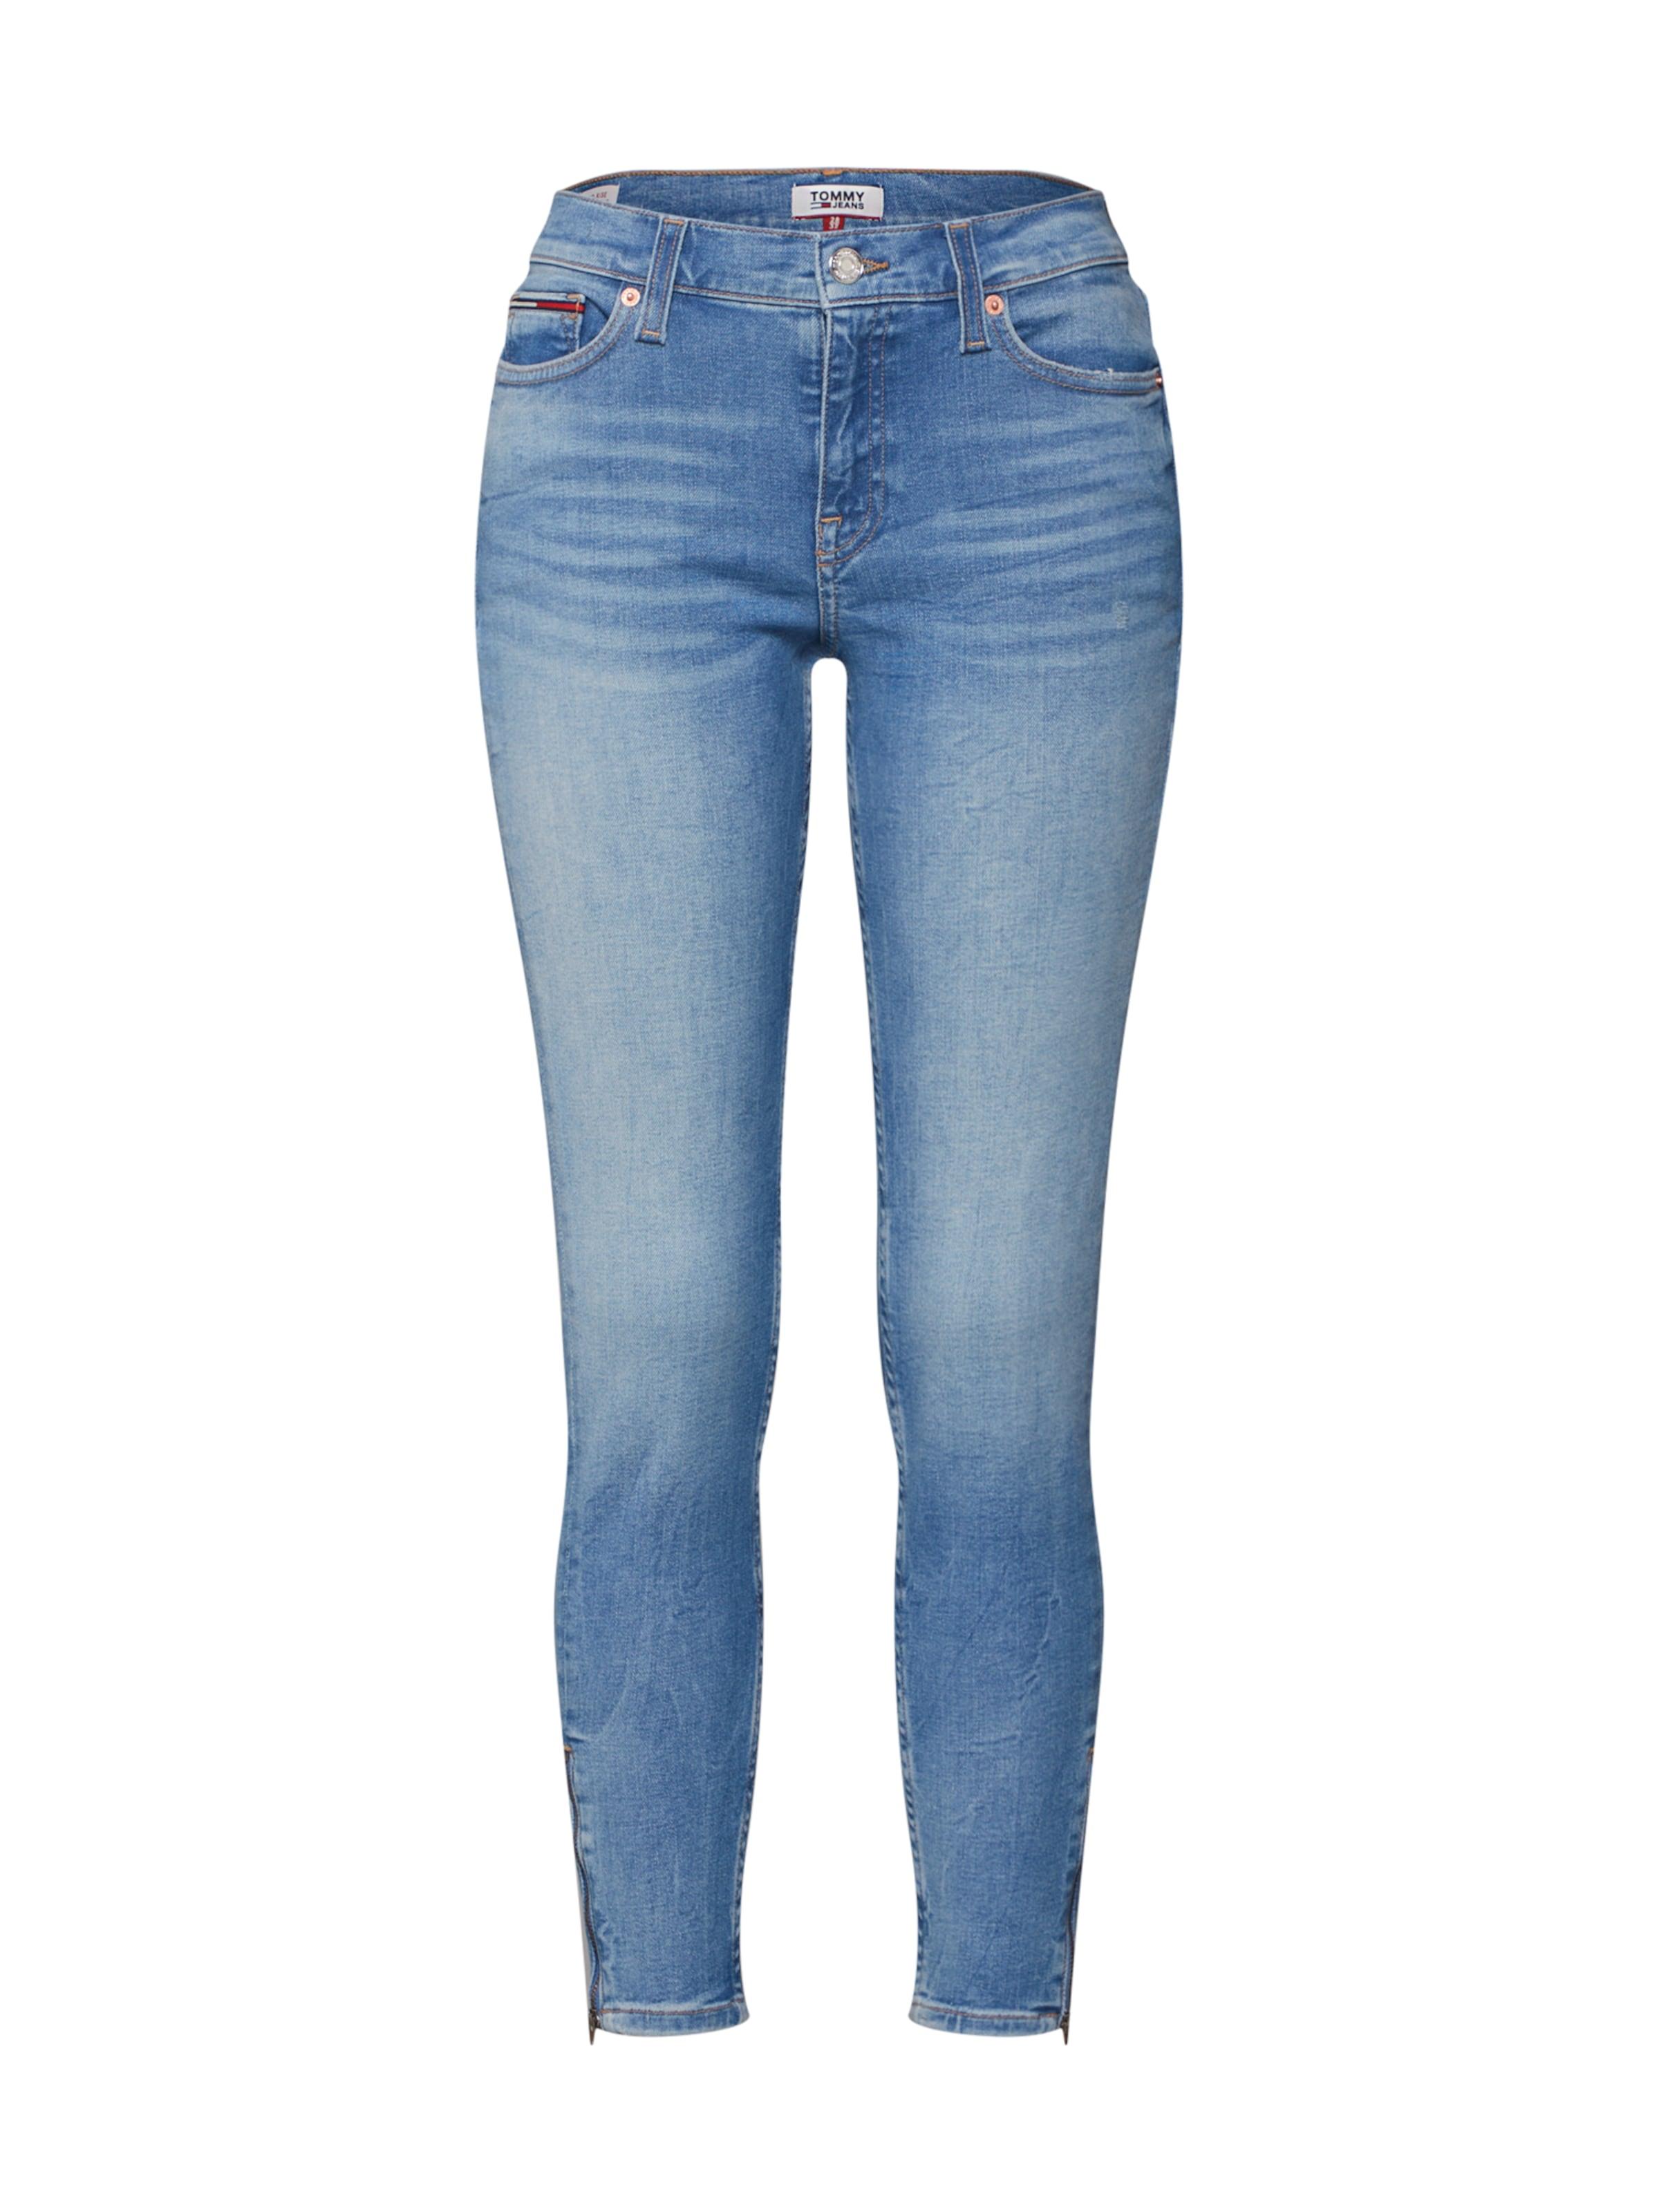 Tommy 'nora' Blue In Jeans Weiß DenimRot 4ARjq53L